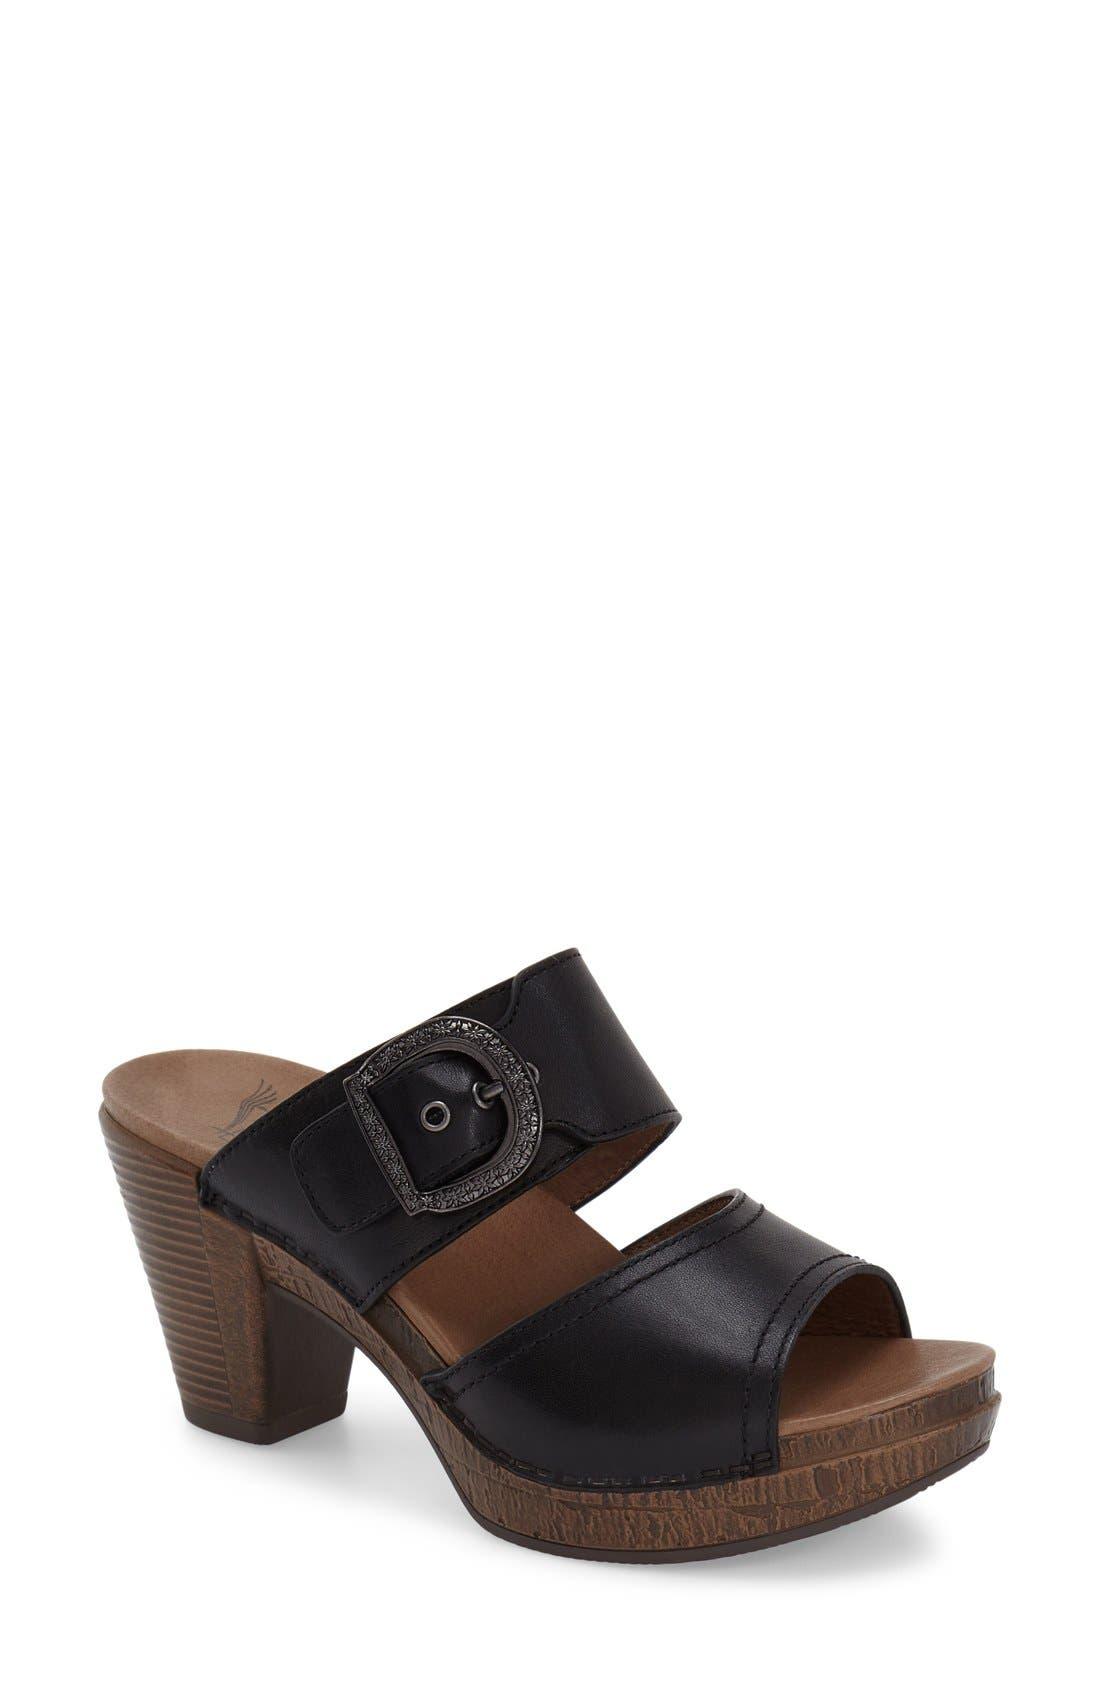 'Ramona' Sandal,                         Main,                         color, Black Leather